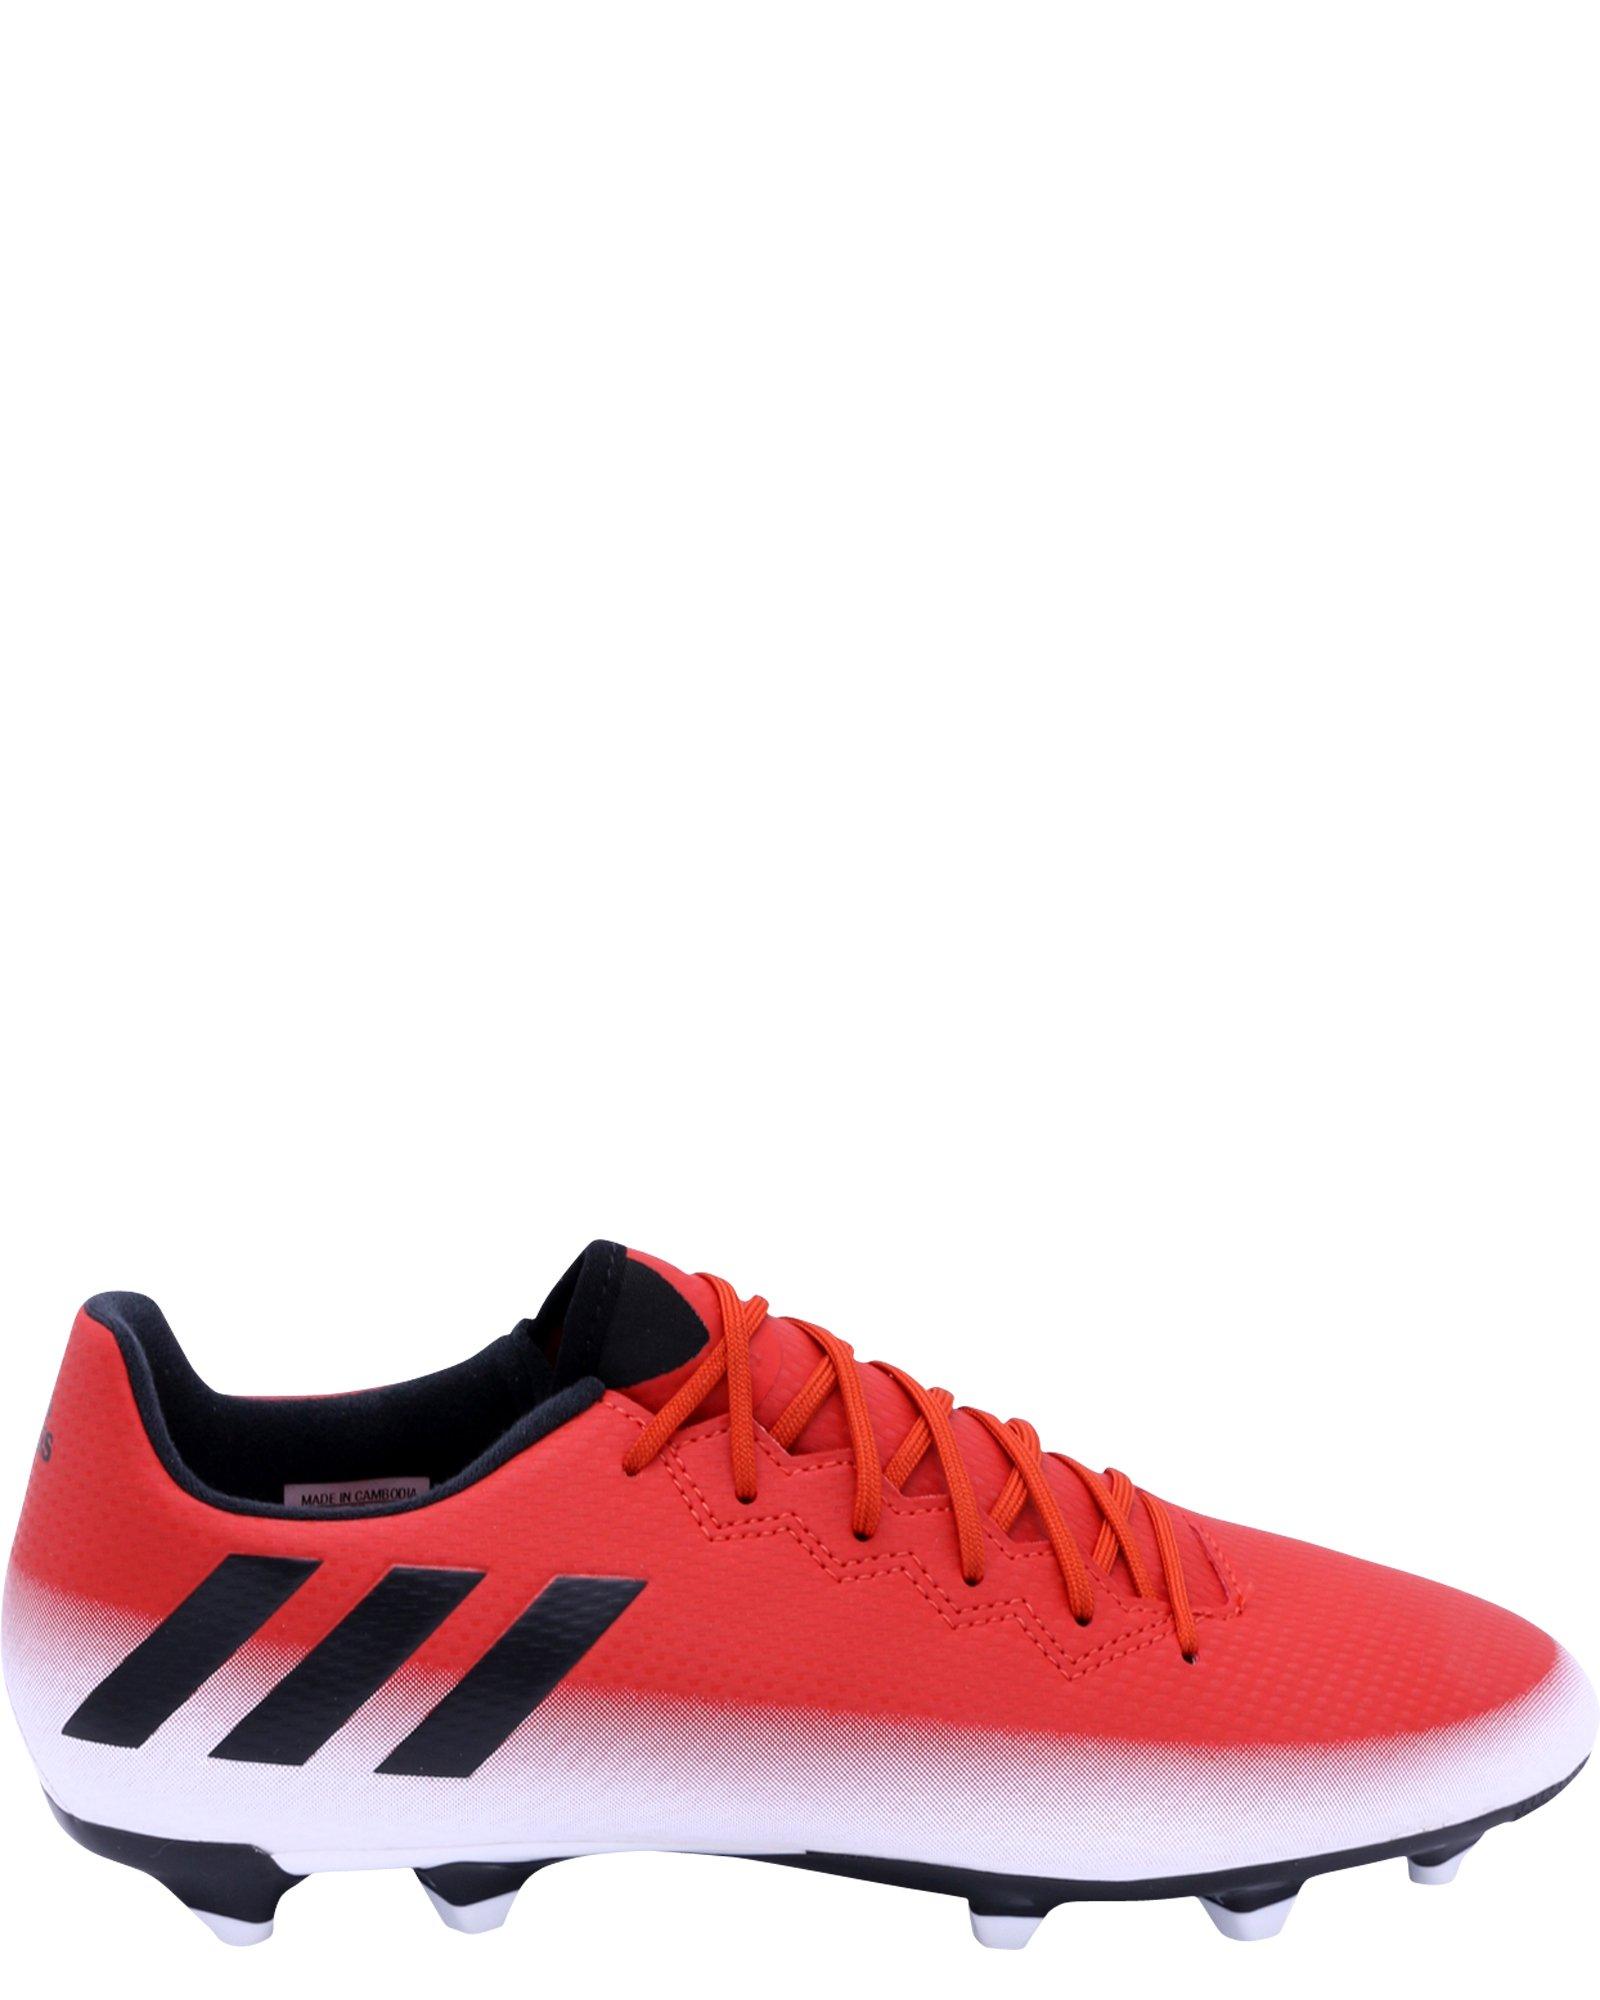 adidas Men's Messi 16.3 FG Soccer Shoe, Red/Black/White, (10 M US)